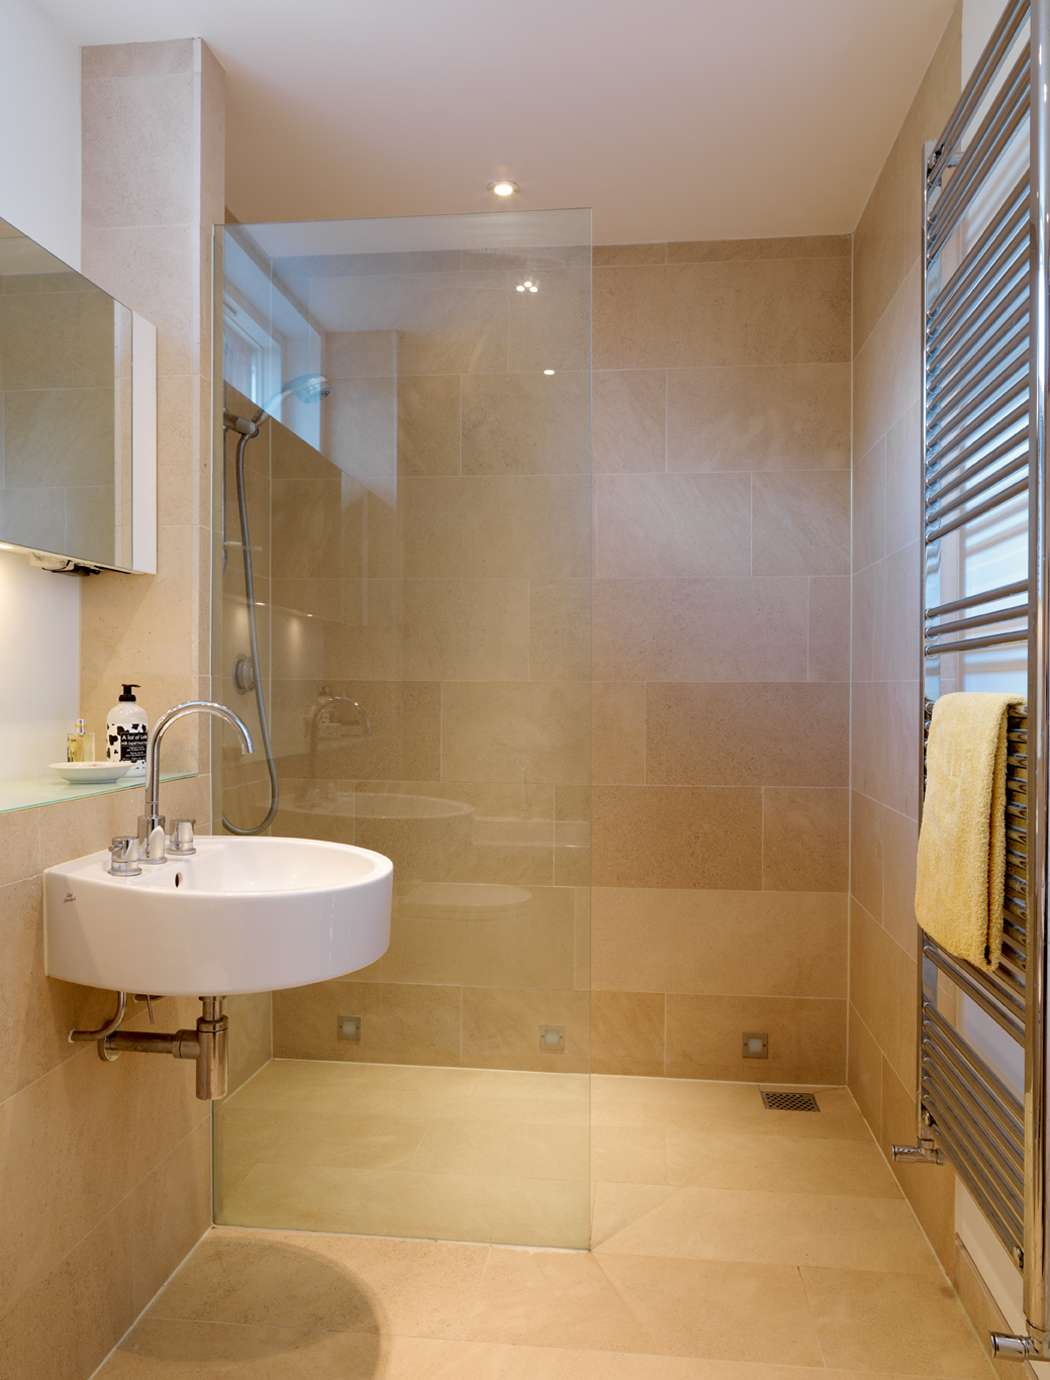 Stylish Small Bathroom Design Ideas for a Space-Efficient ... on Bathroom Designs For Small Spaces  id=33657